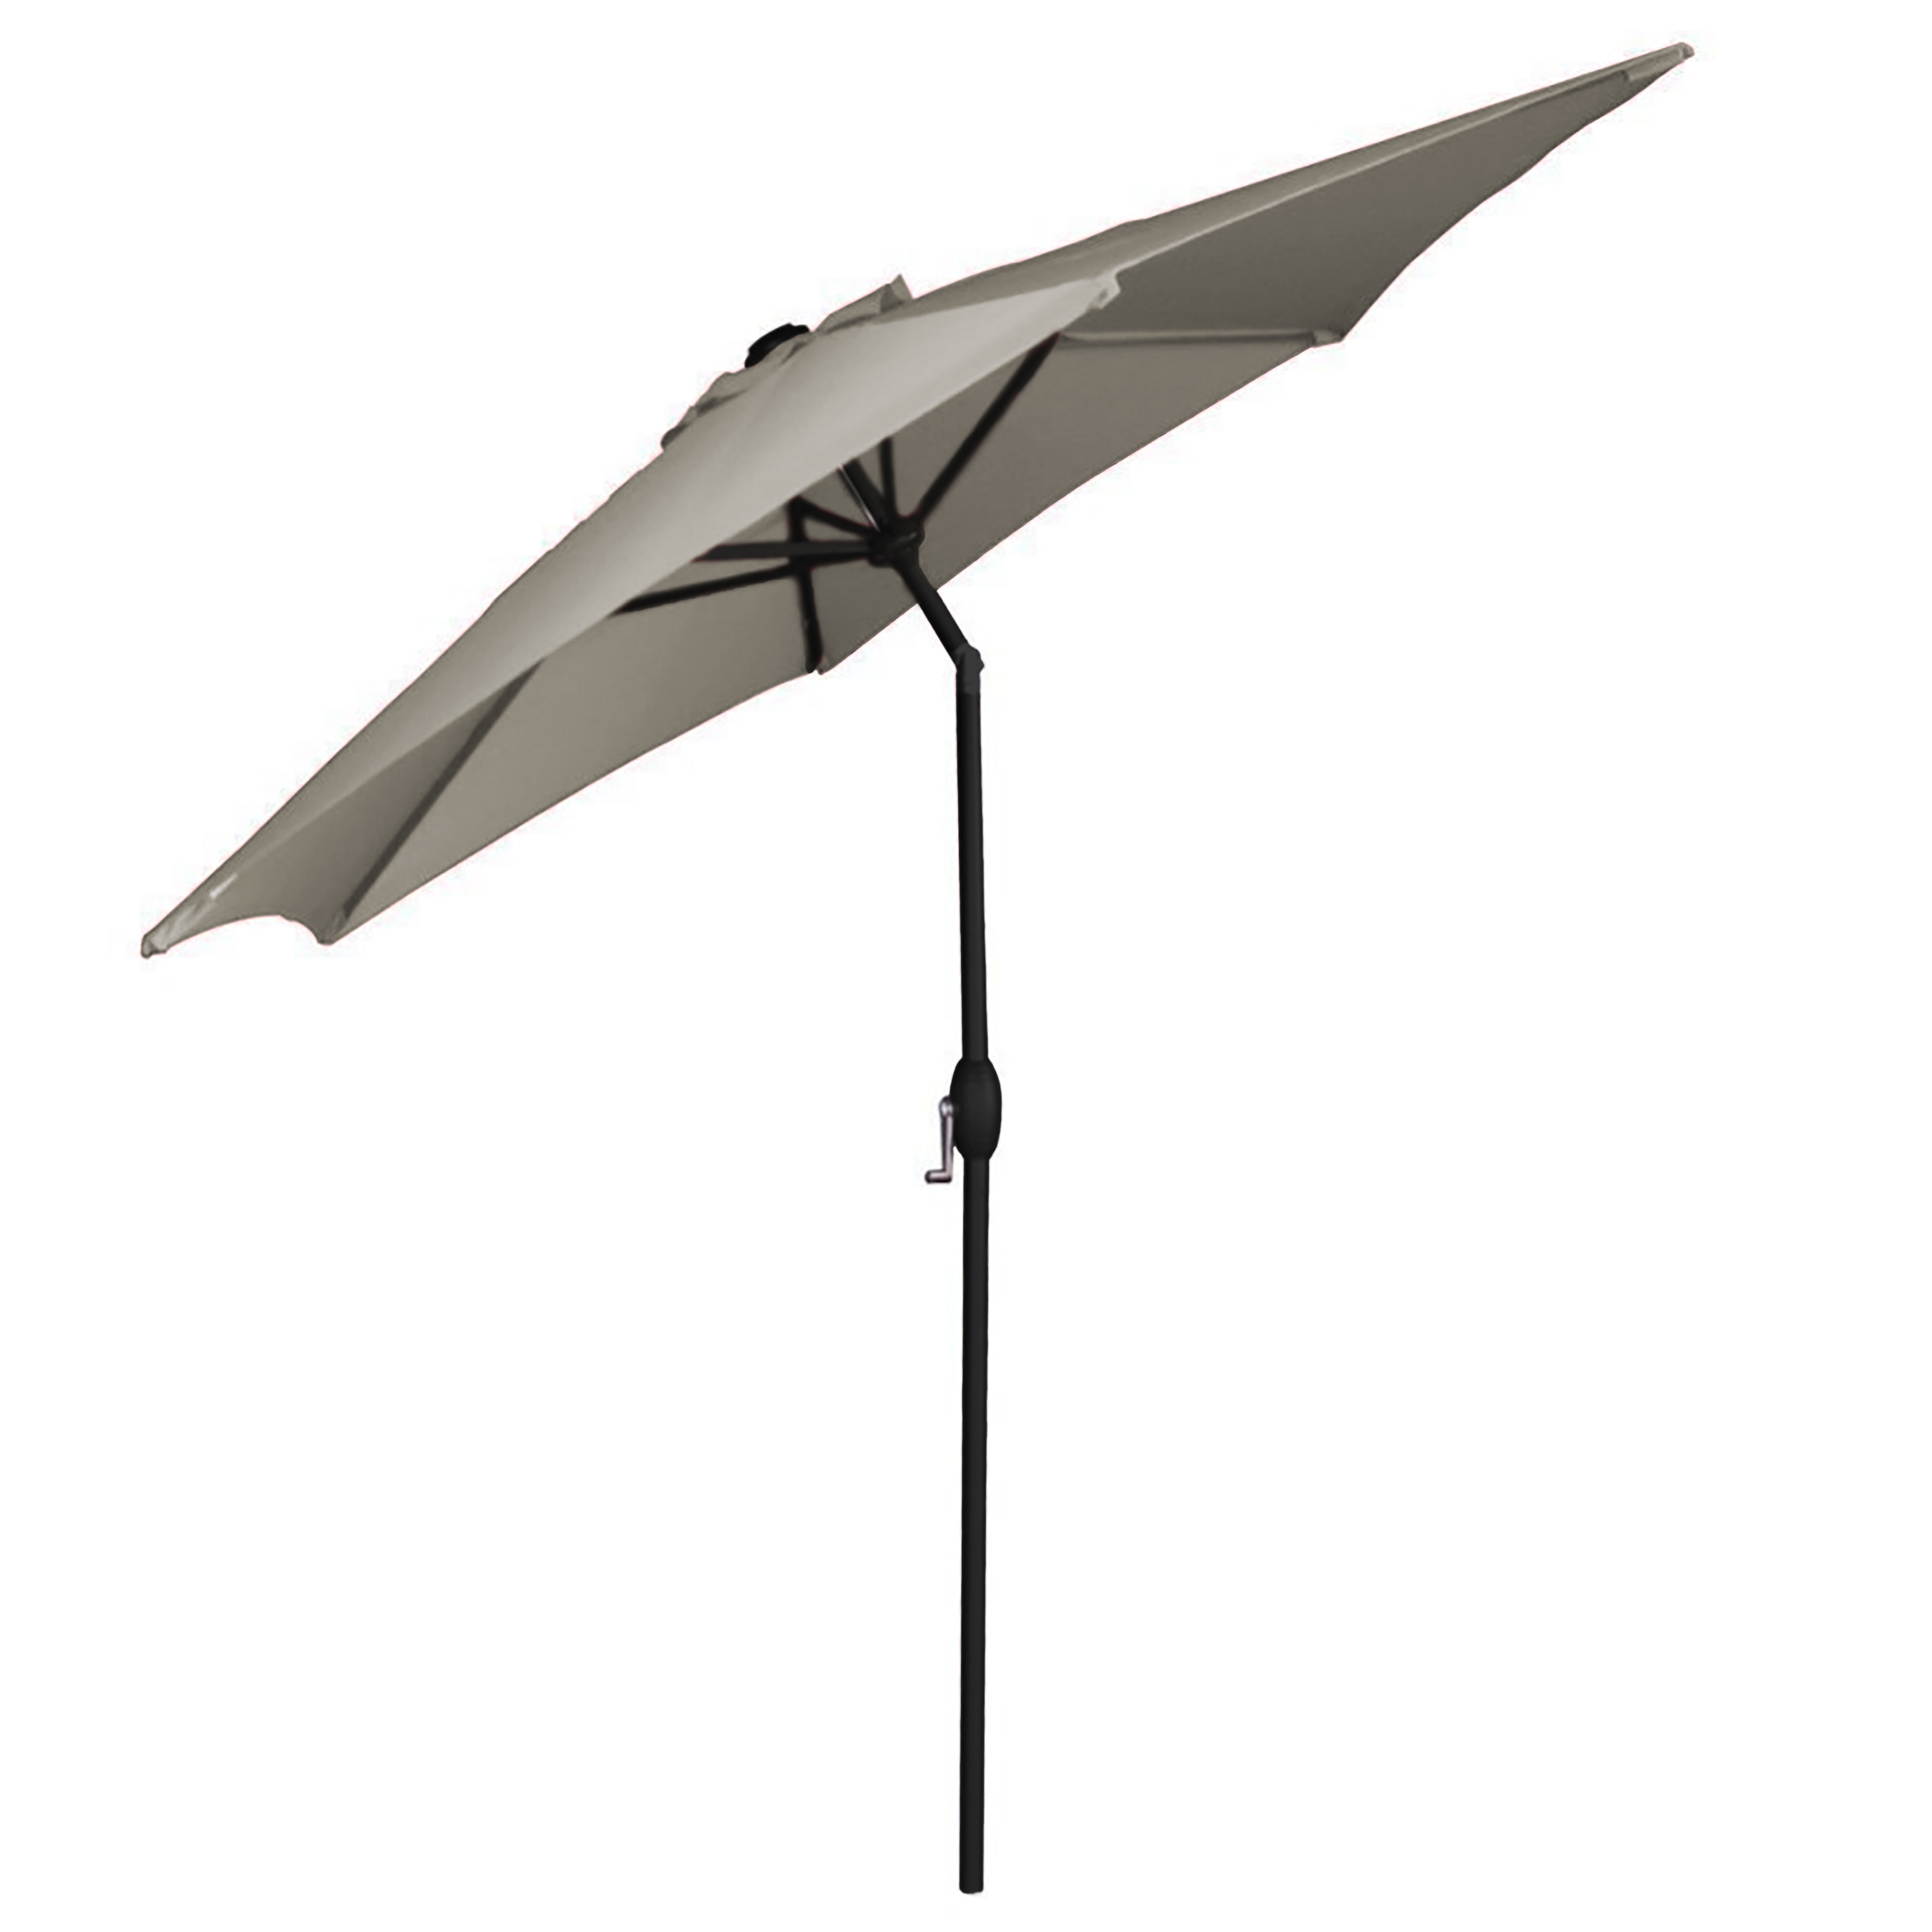 Trendy Alyssa Freeport Park Market Umbrellas Throughout Panama Market Umbrella (View 17 of 20)